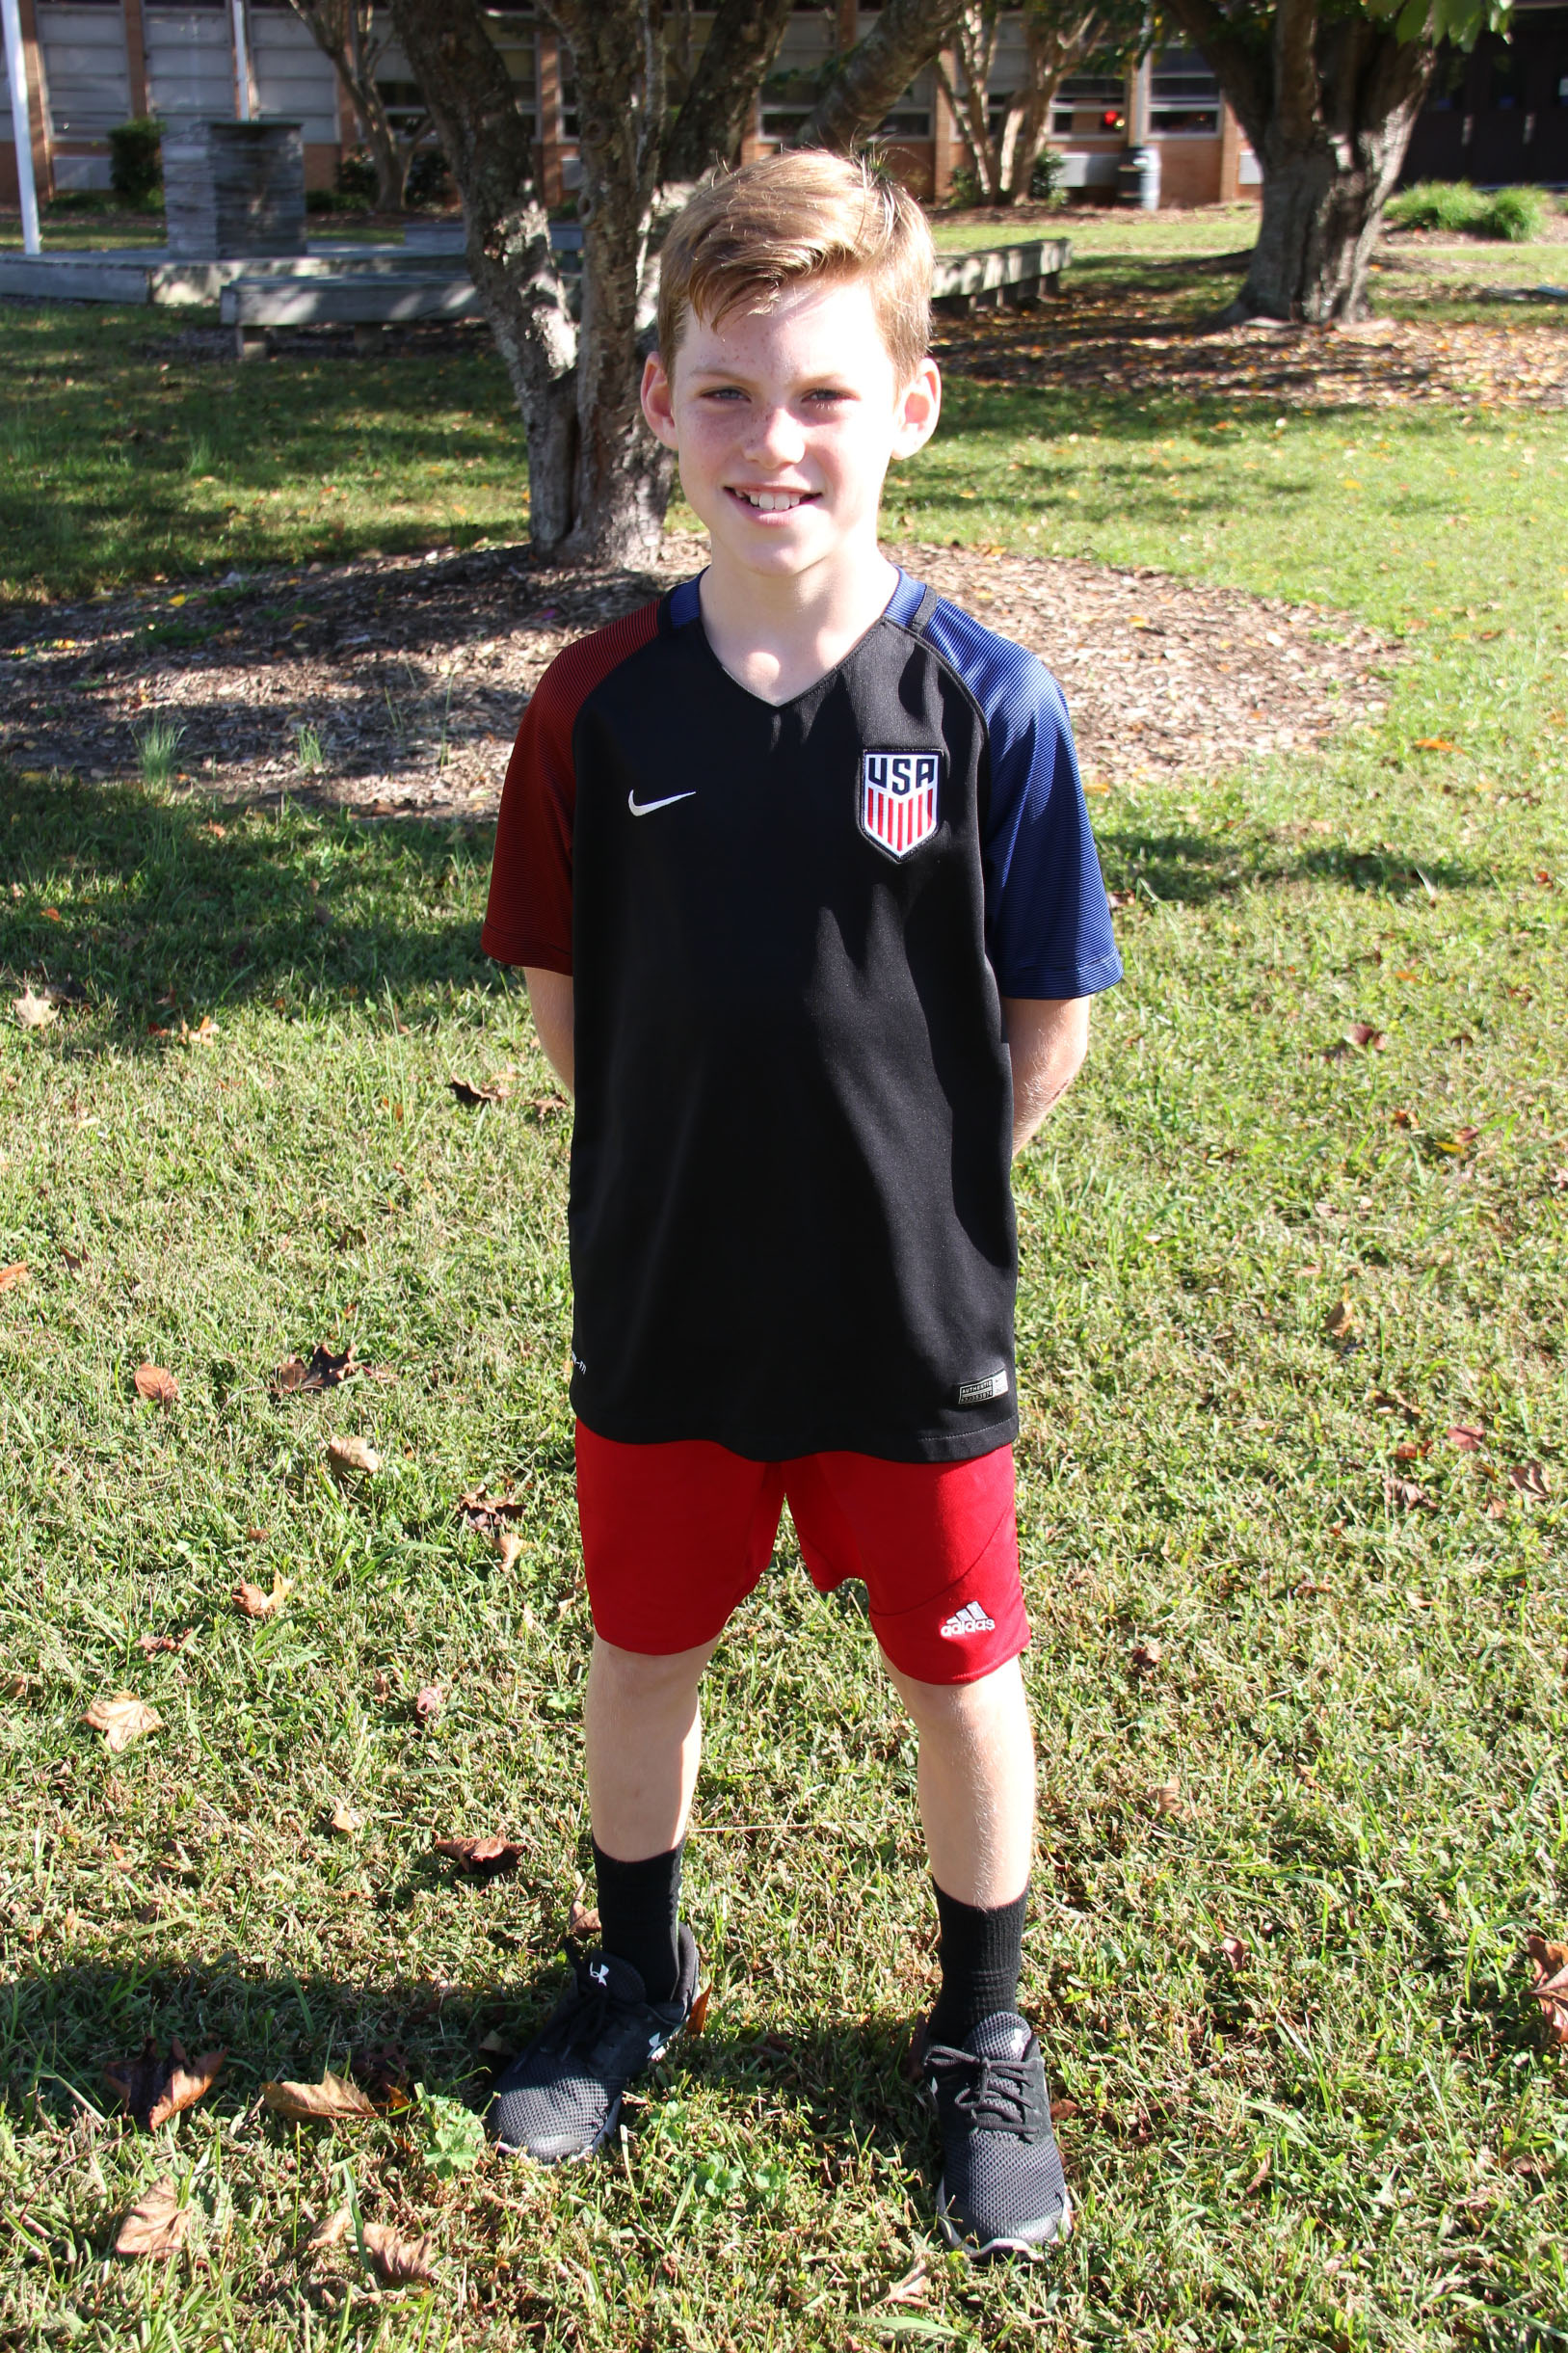 kingston-es-soccer-player